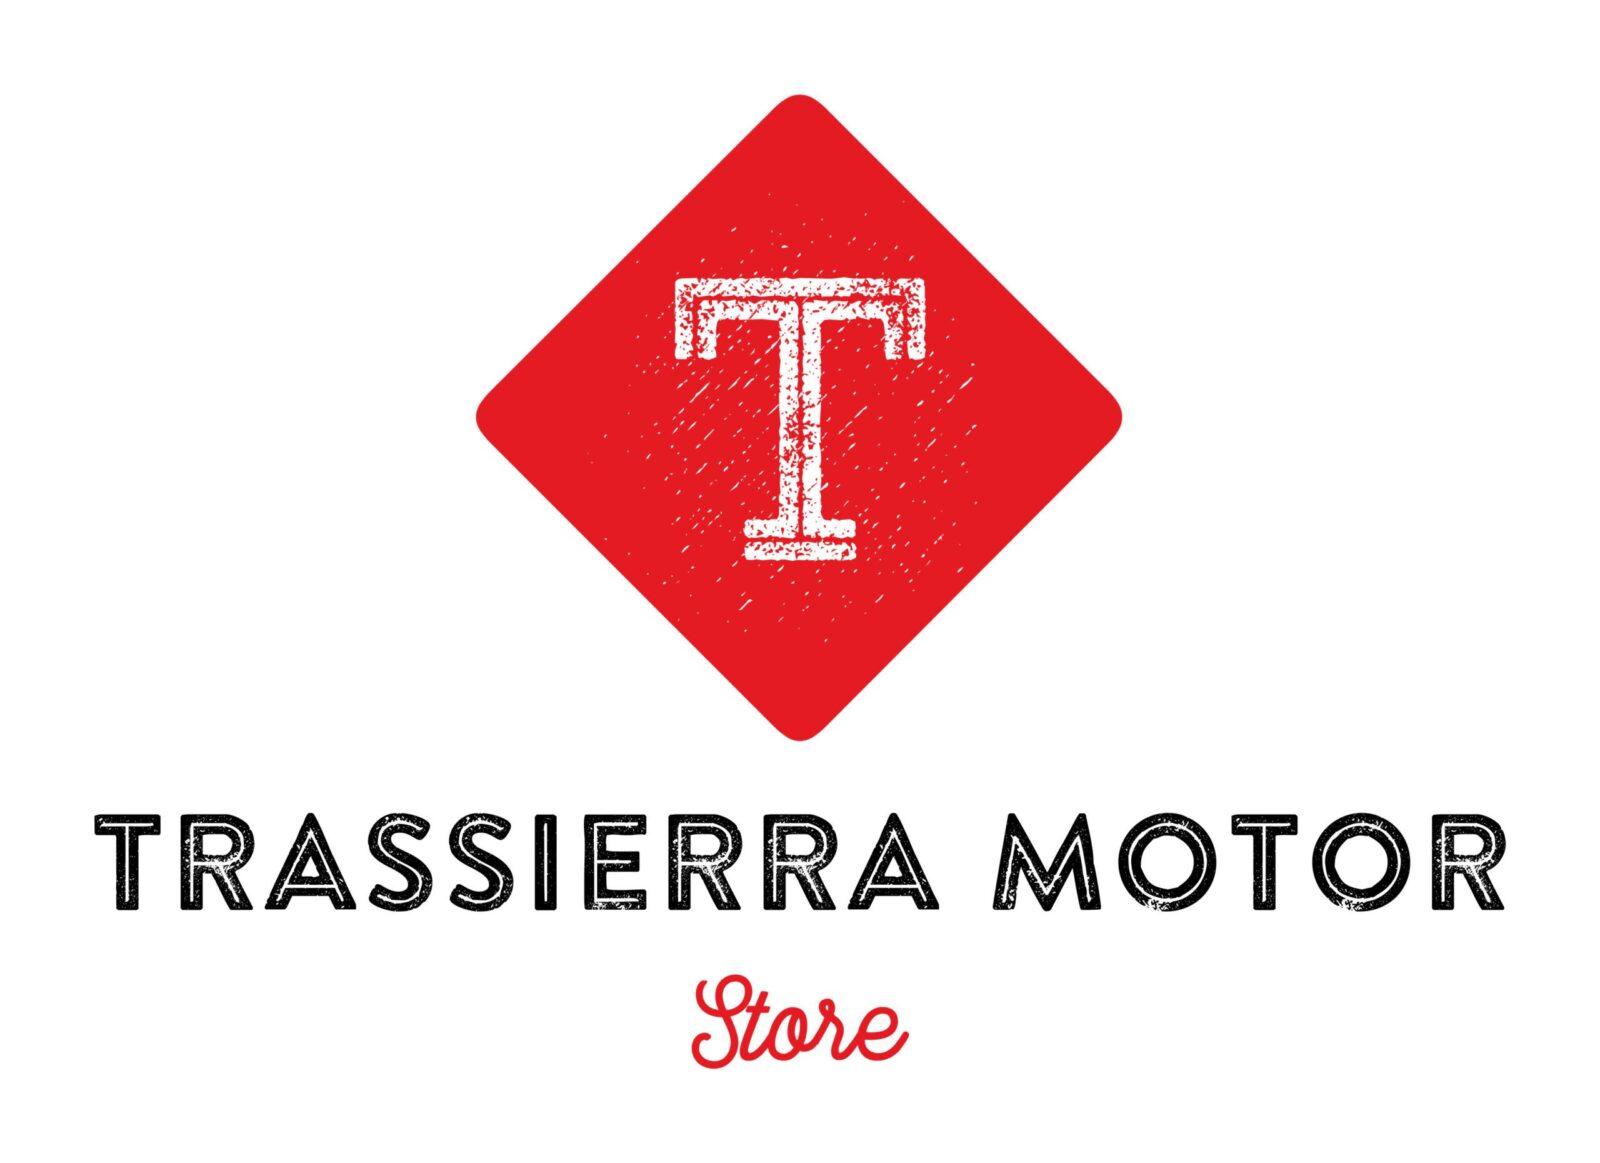 TrassierraMotorStore